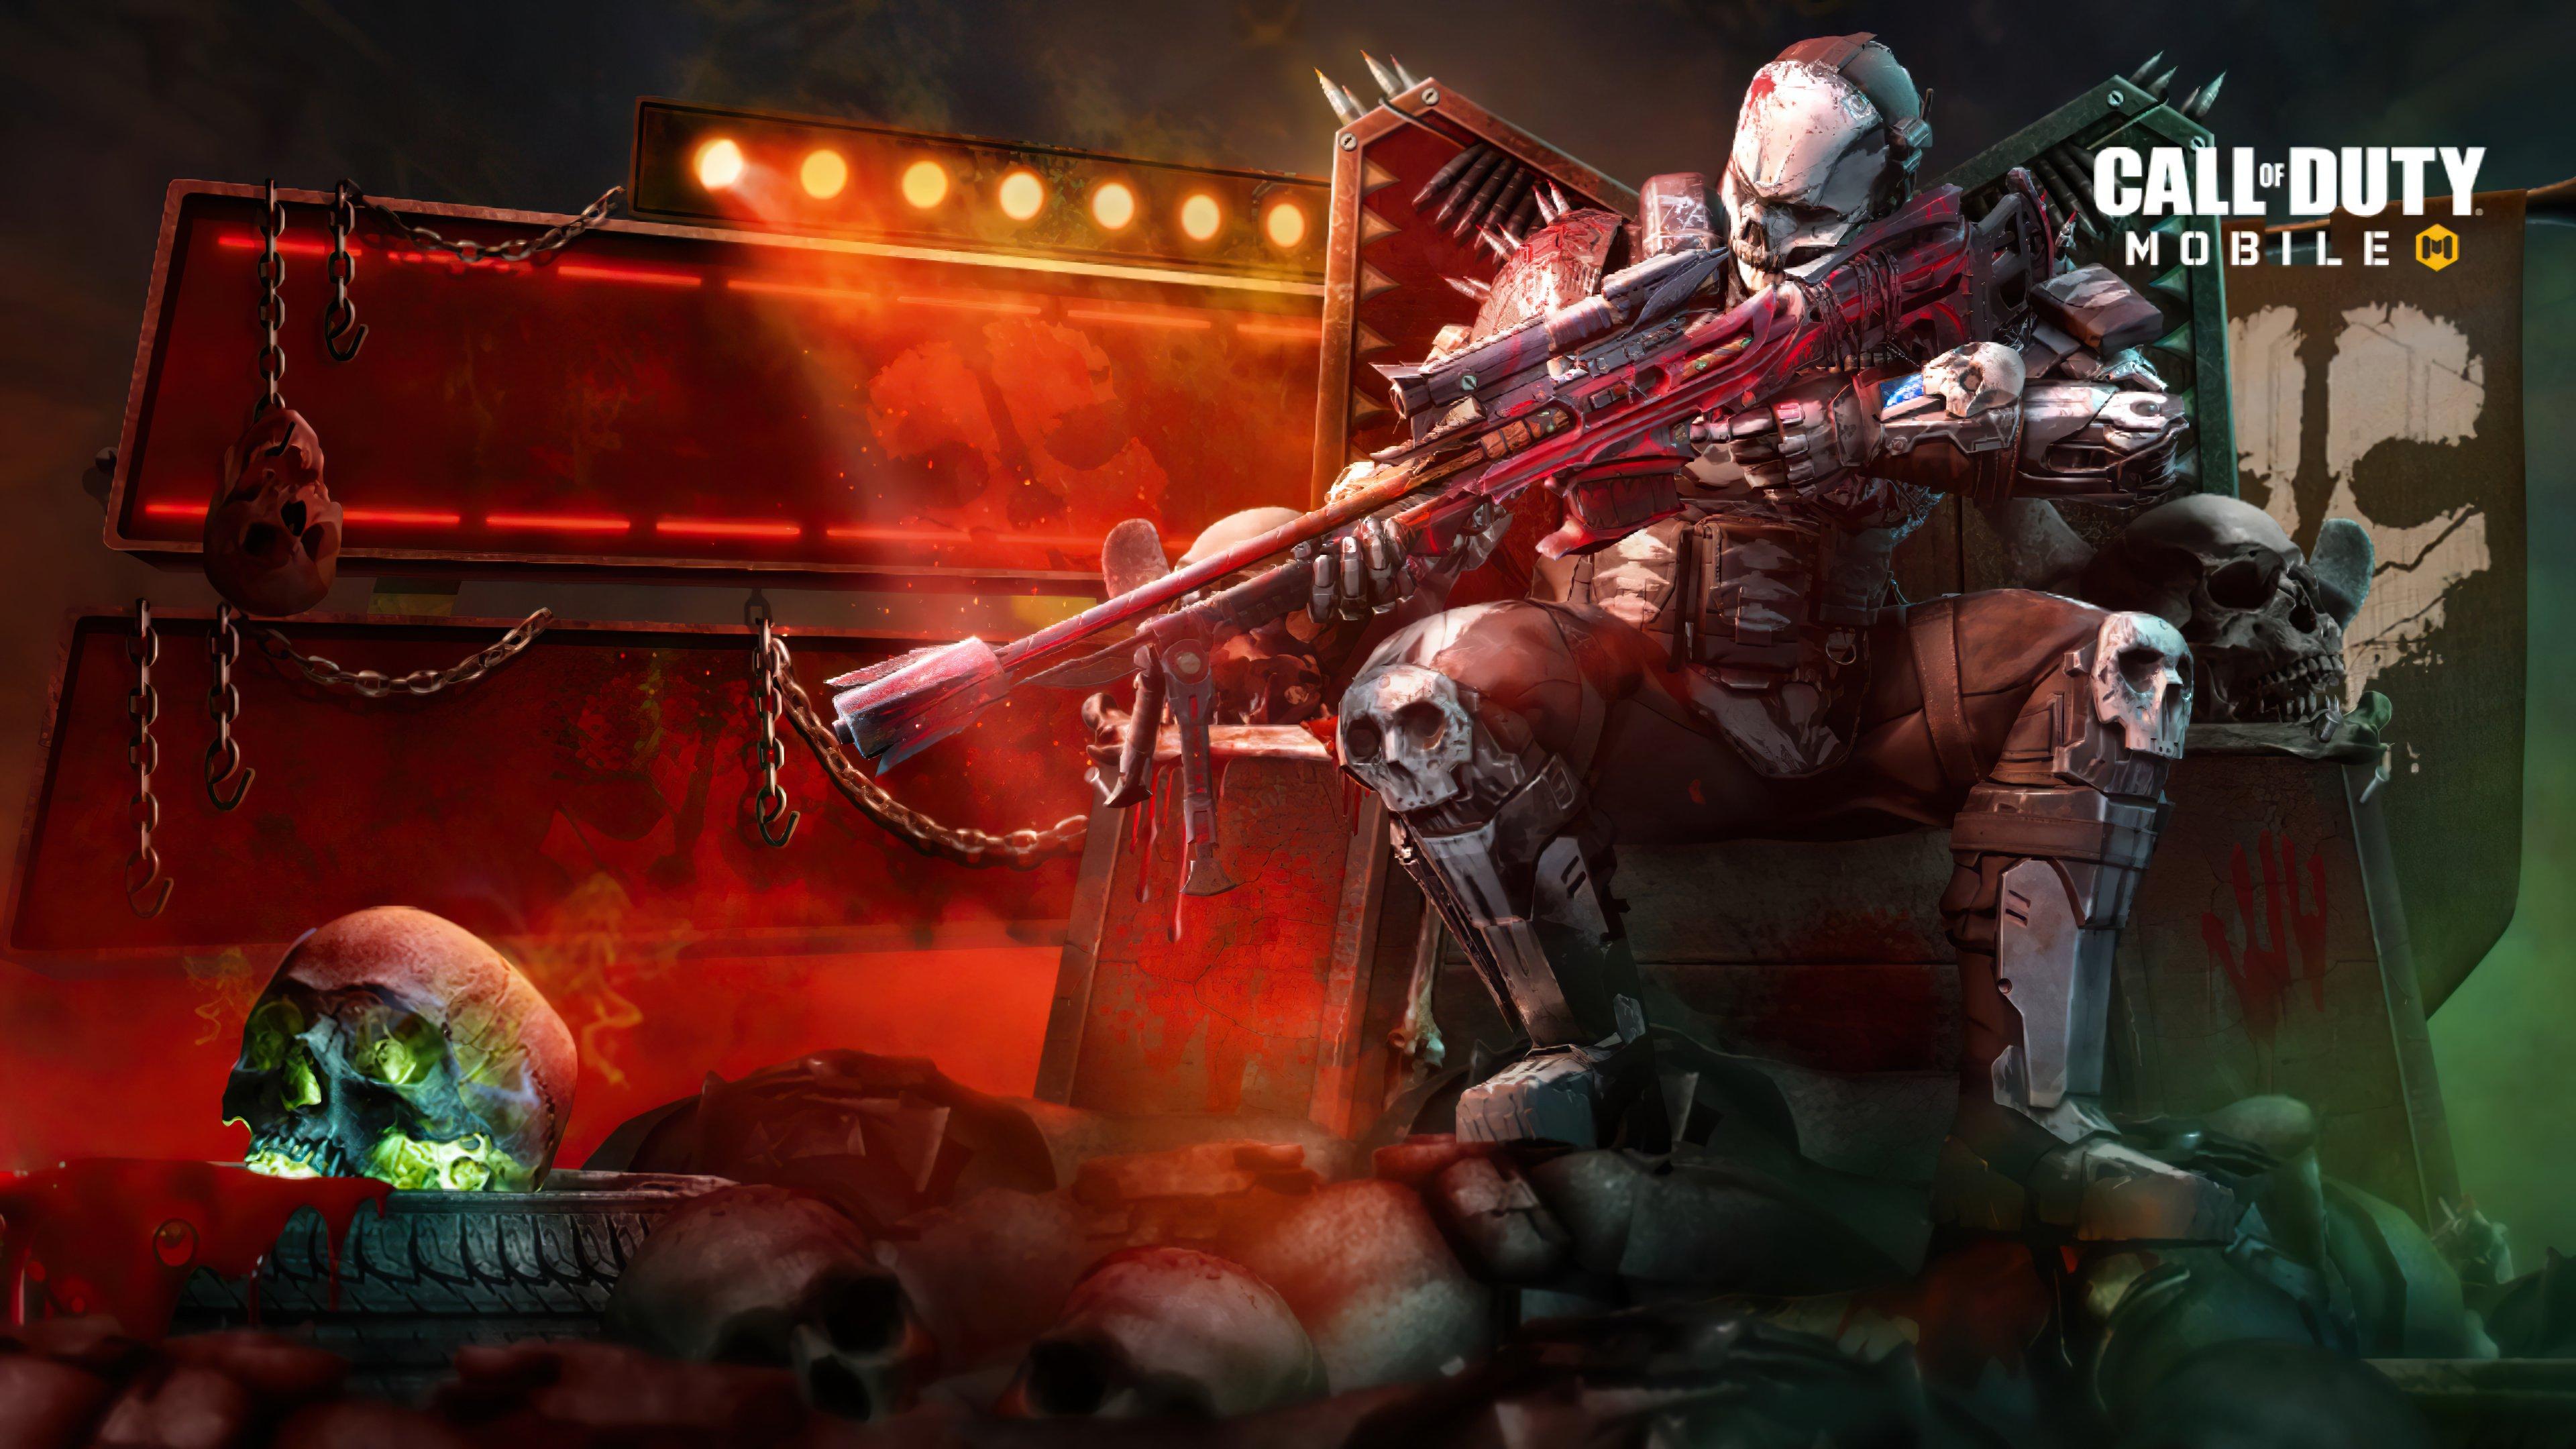 Fondos de pantalla Call of Duty Mobile rune bone warrior